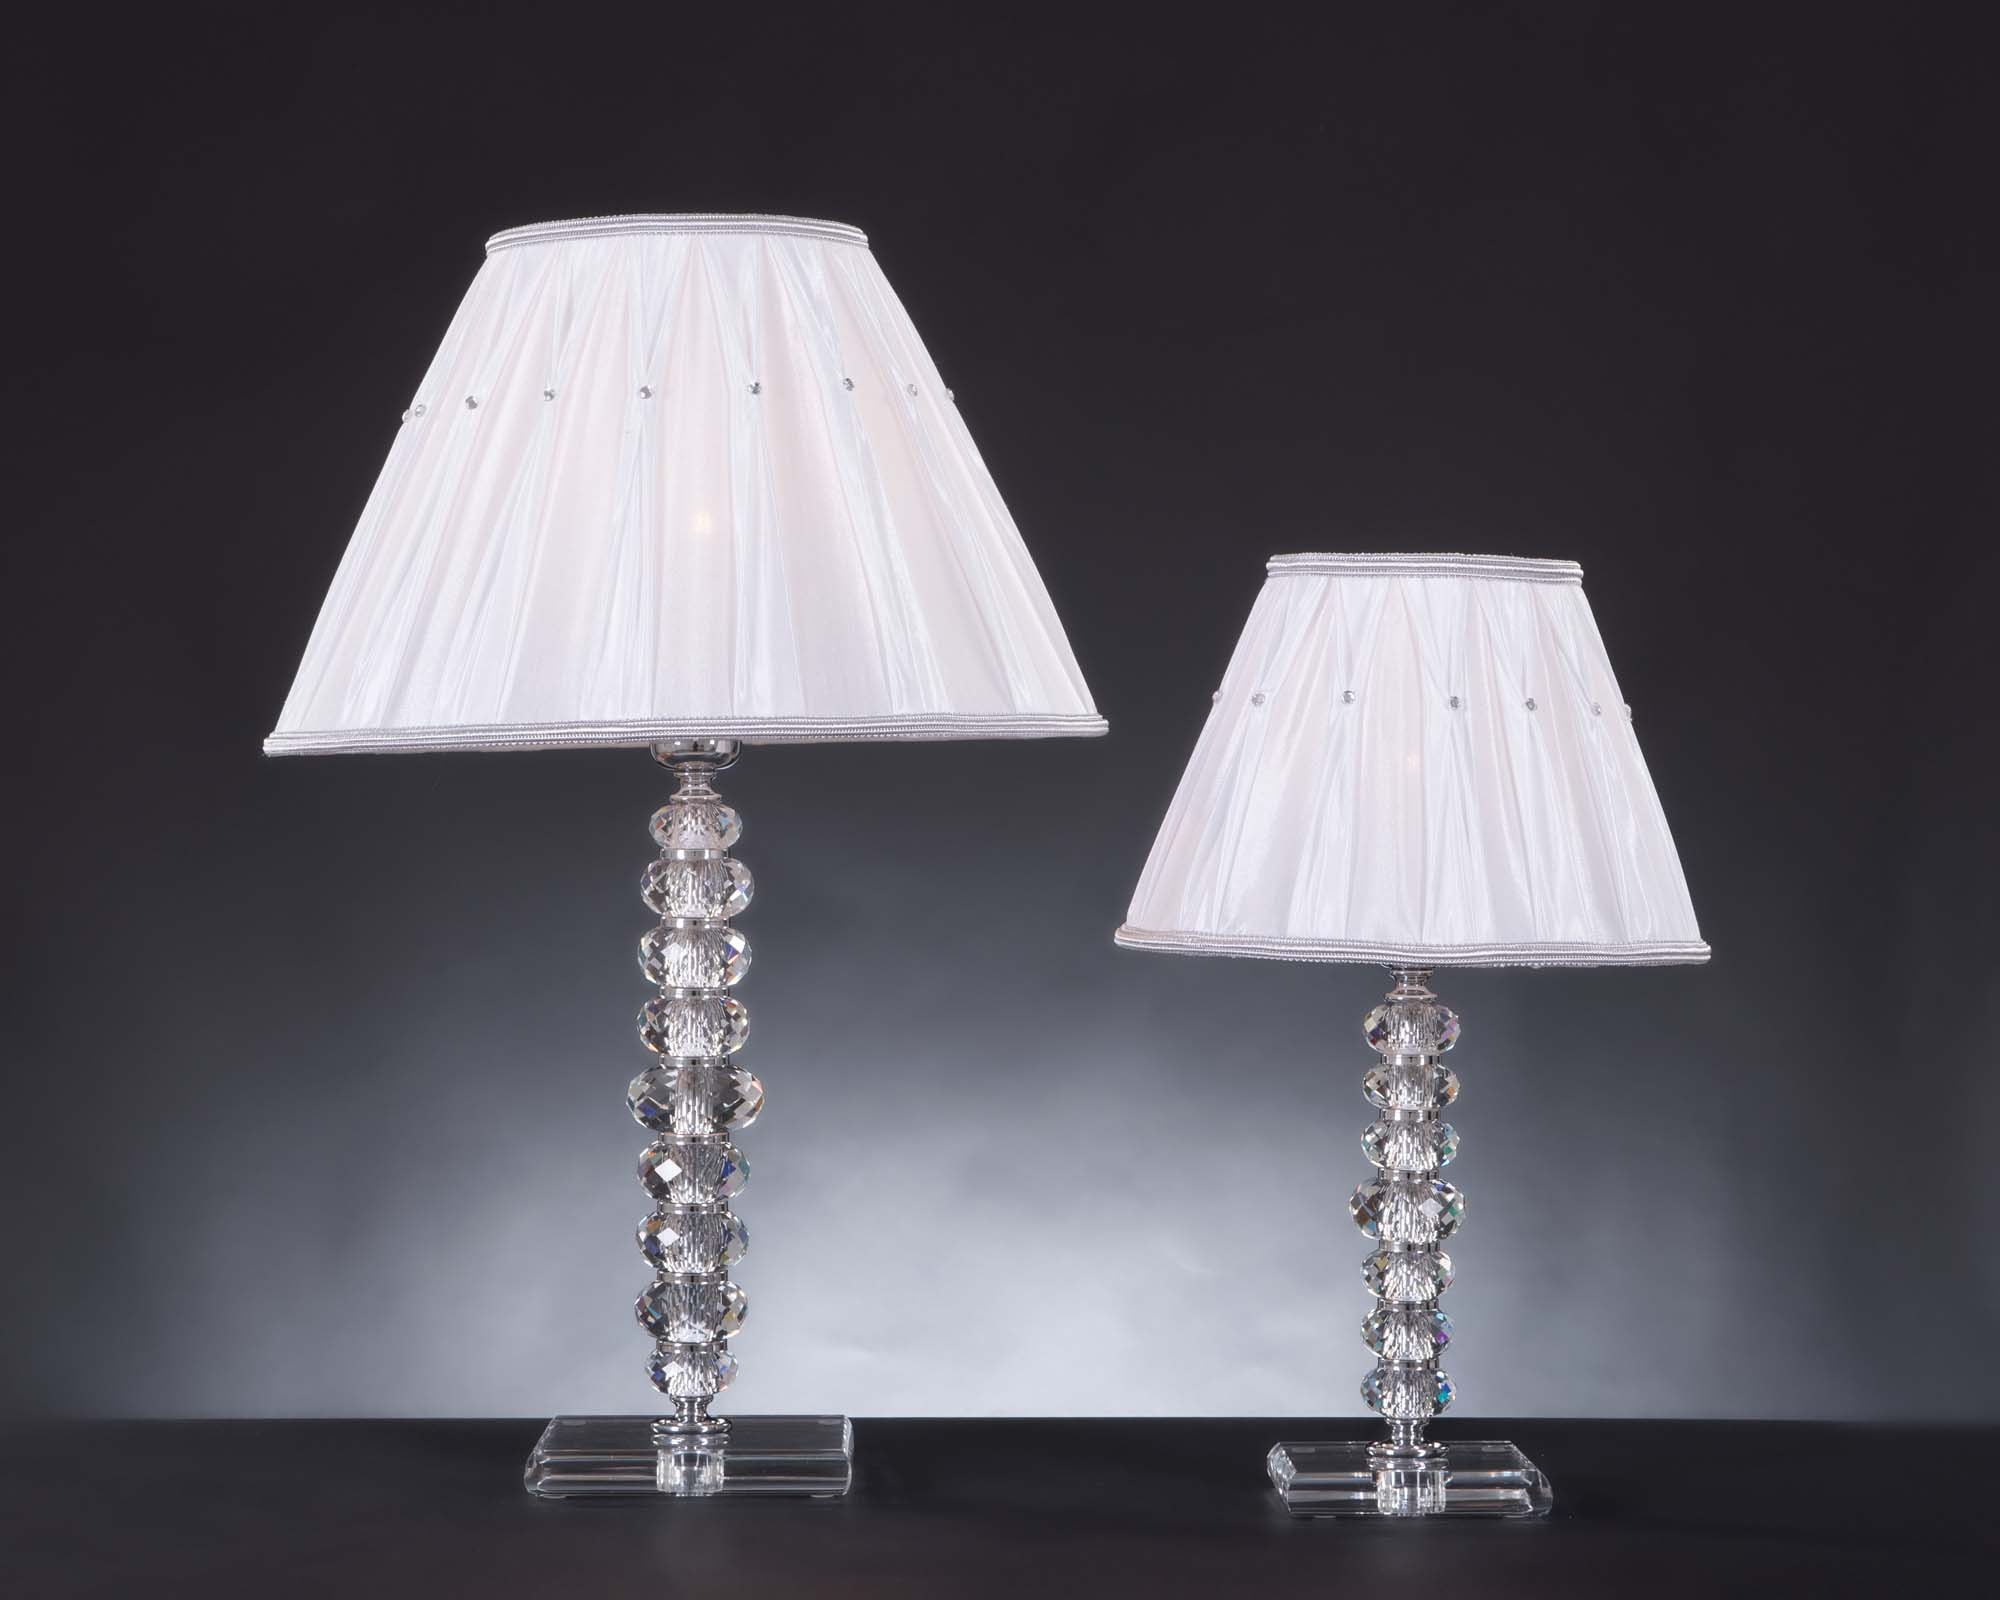 Lume grande moderno in cristallo 1 luce design swarovsky irene